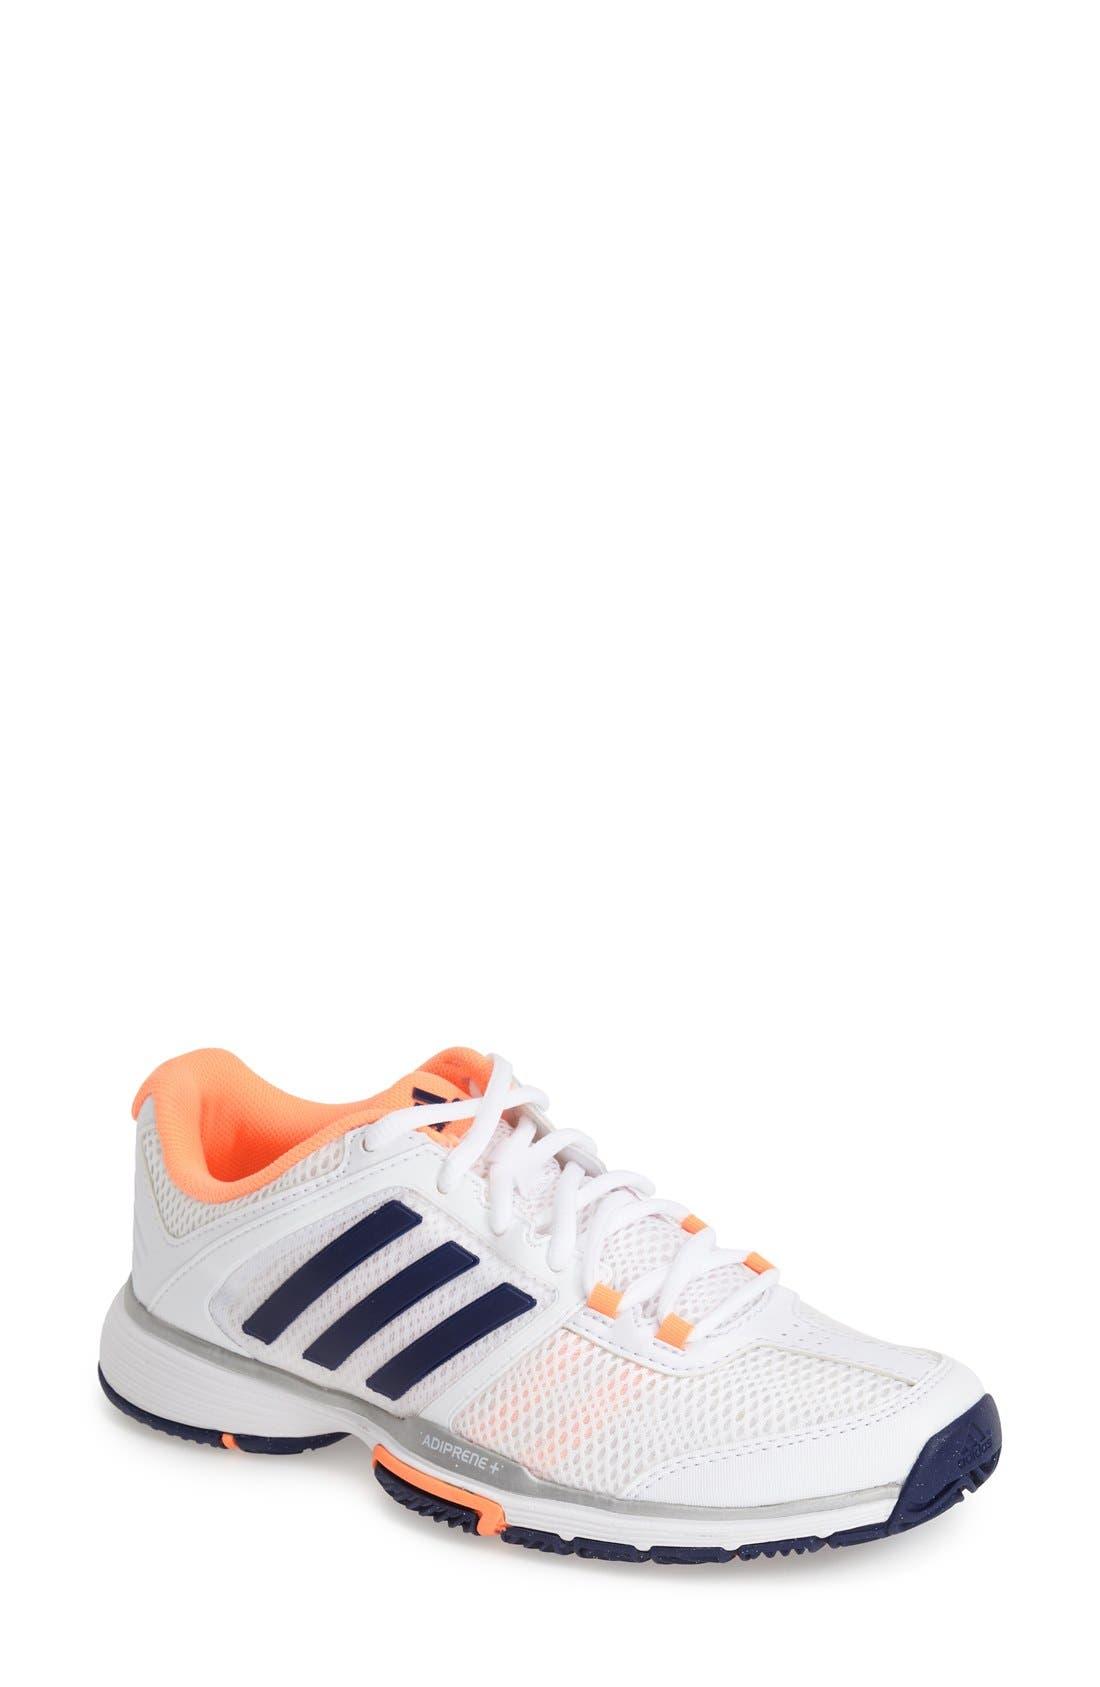 Alternate Image 1 Selected - adidas 'adiPower Barricade Team 4' Tennis Shoe (Women)